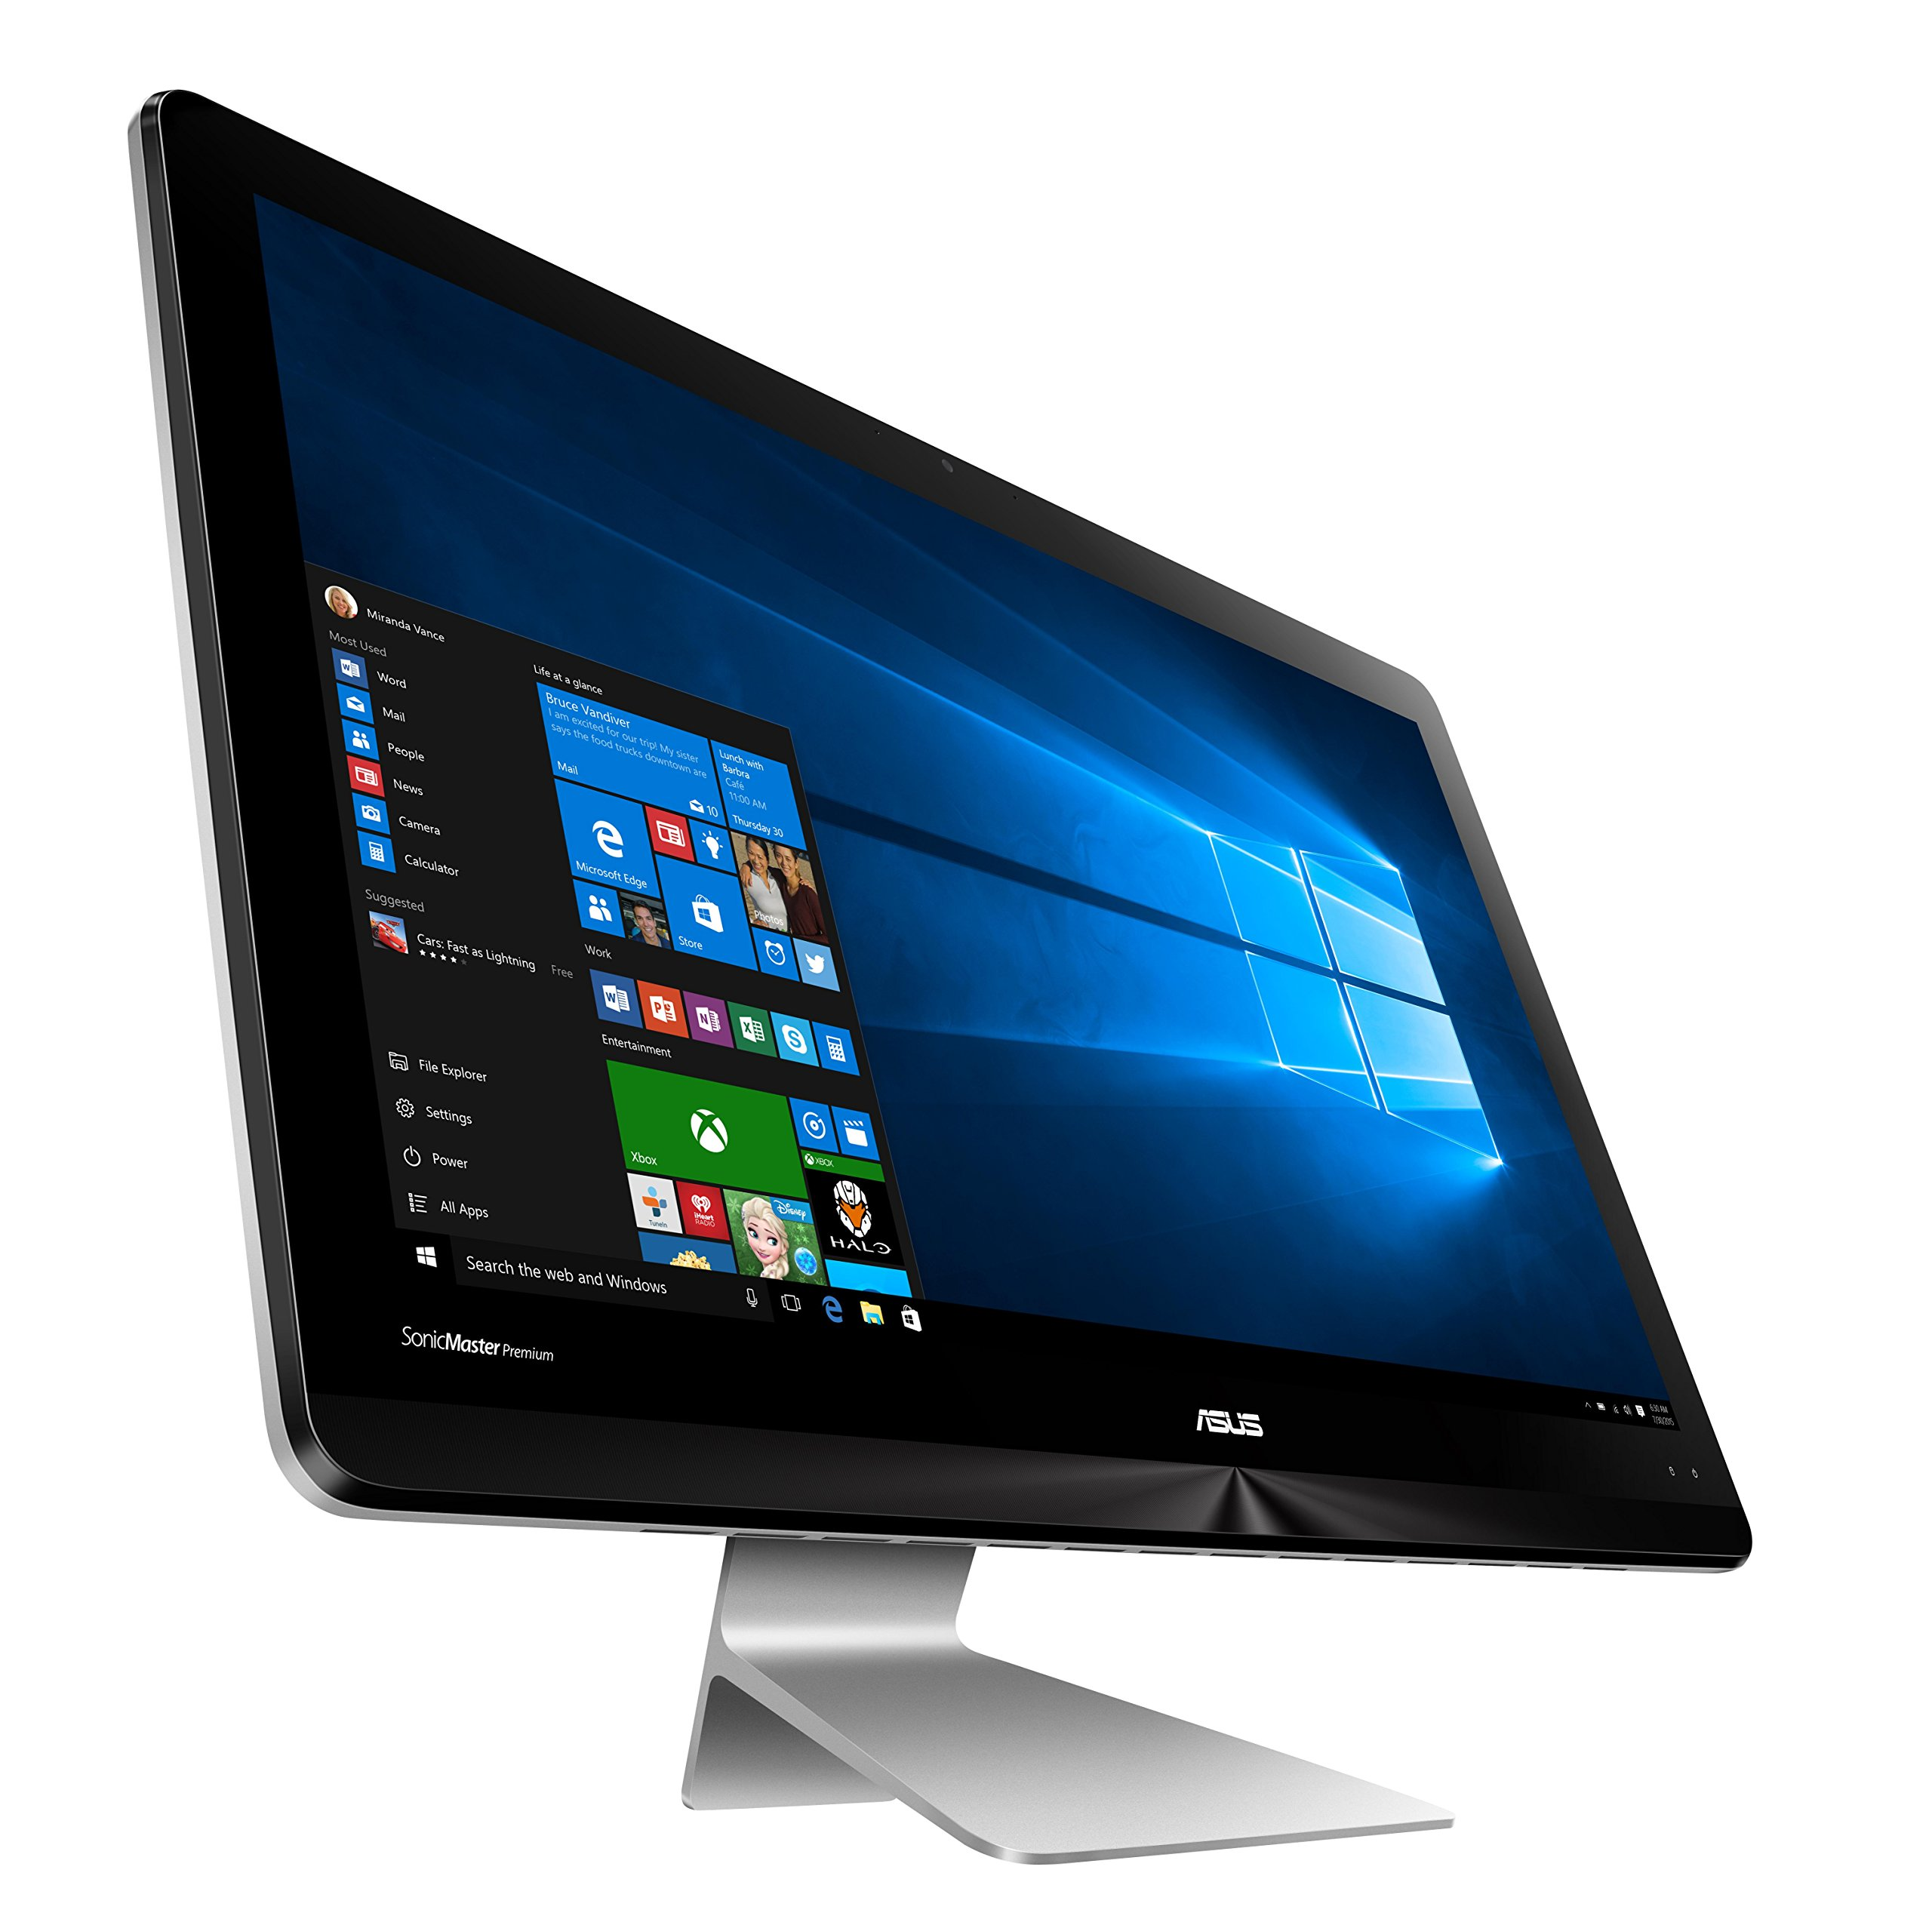 Asus Zen All in One zn220icgt de rg016 X 54,6 cm (21,5 Pulgadas) All-in-One Desktop PC (Intel Core i5 – 6200u, Memoria de 8 GB, 1TB + 128GB SSD, nVidia gtx930mx, Win